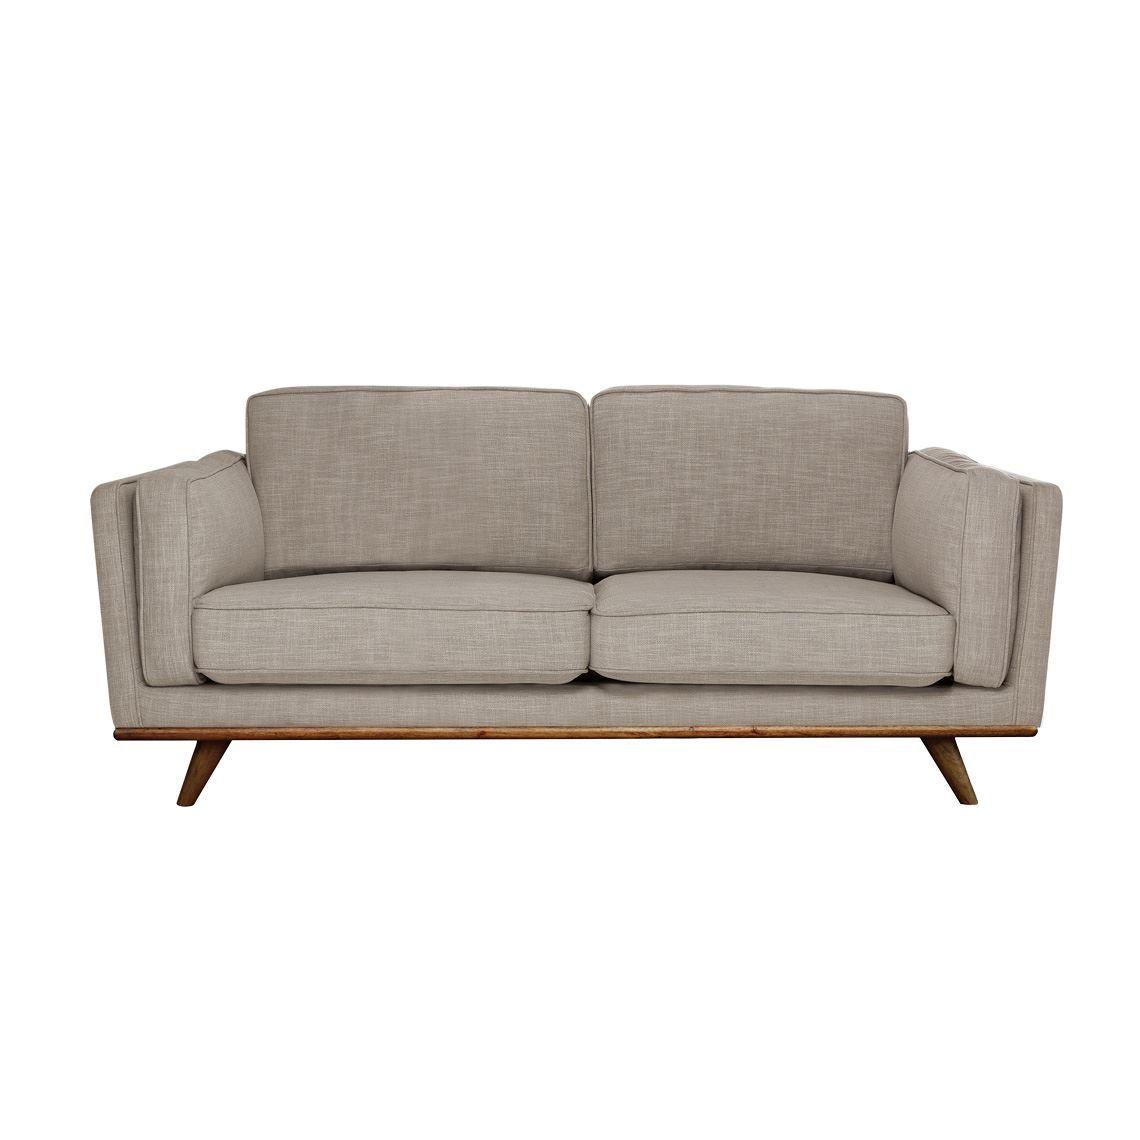 Dahlia 2 Seat Fabric Sofa Size W 166cm X D 93cm X H 80cm In Shell 90 Polyester 10 Linen Woven Freedom Fabric Sofa Elegant Sofa Sofa